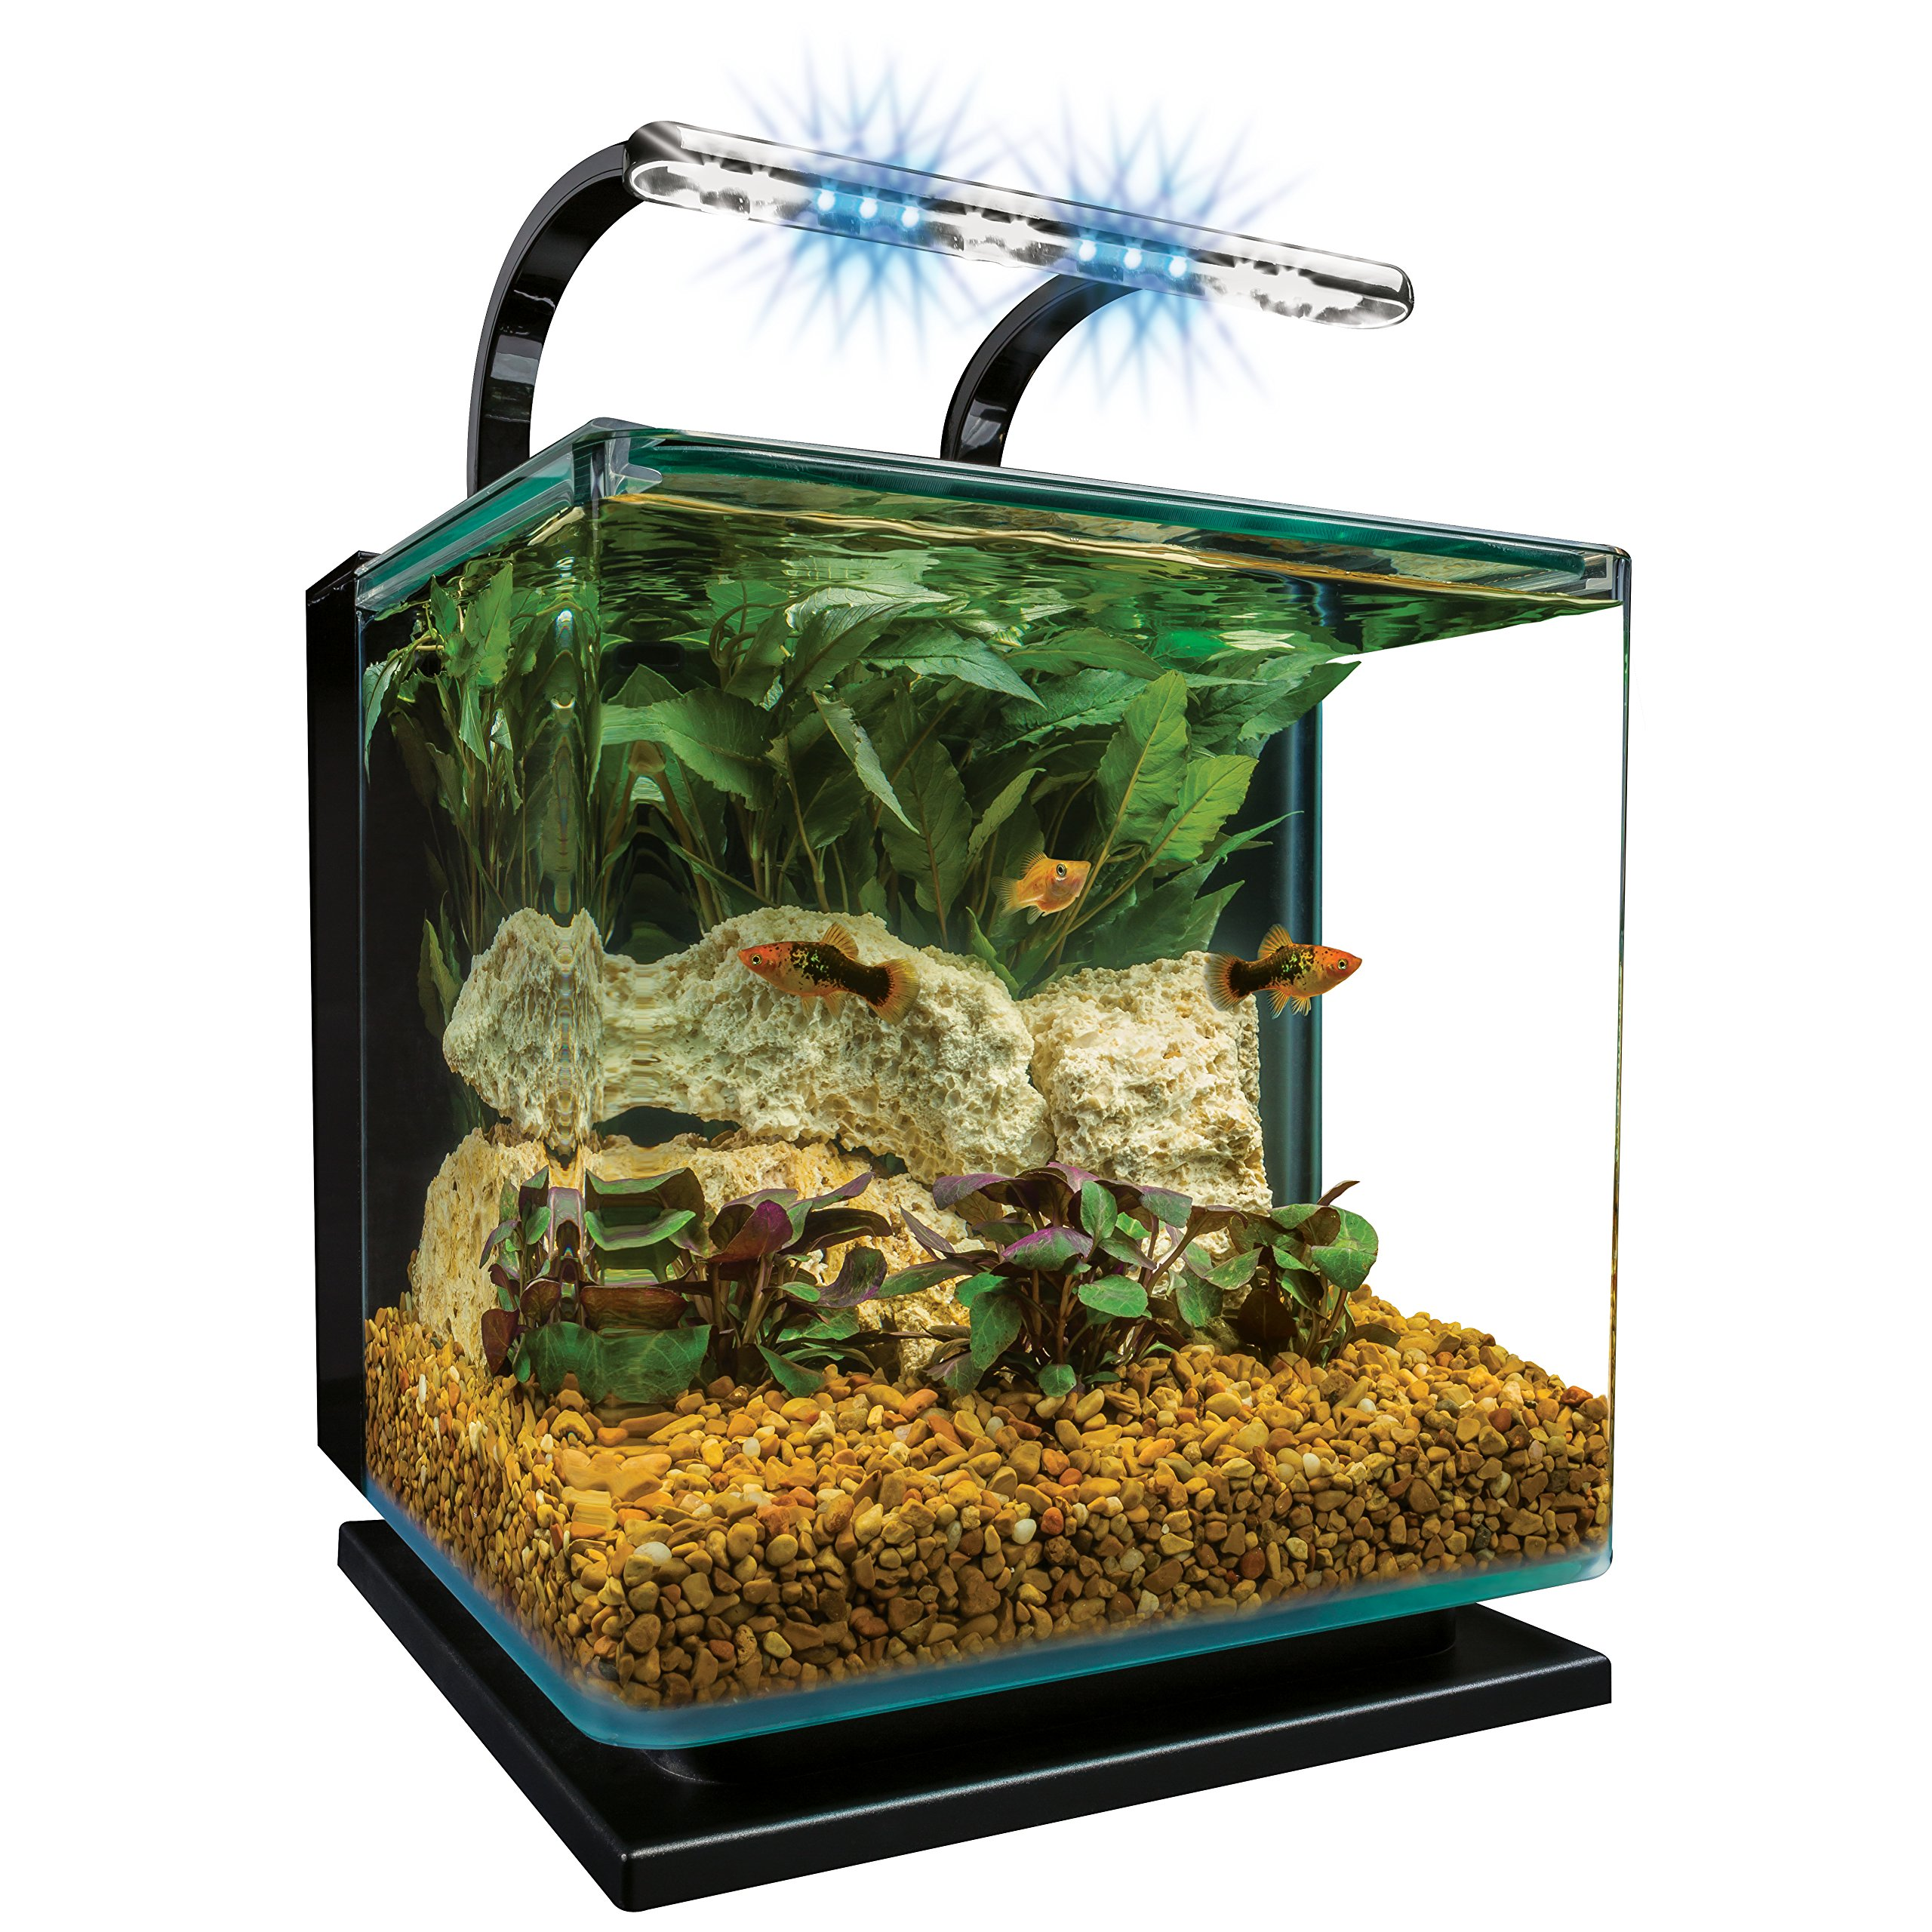 Marineland Contour Glass Aquarium Kit with Rail Light, 3-Gallon by MarineLand